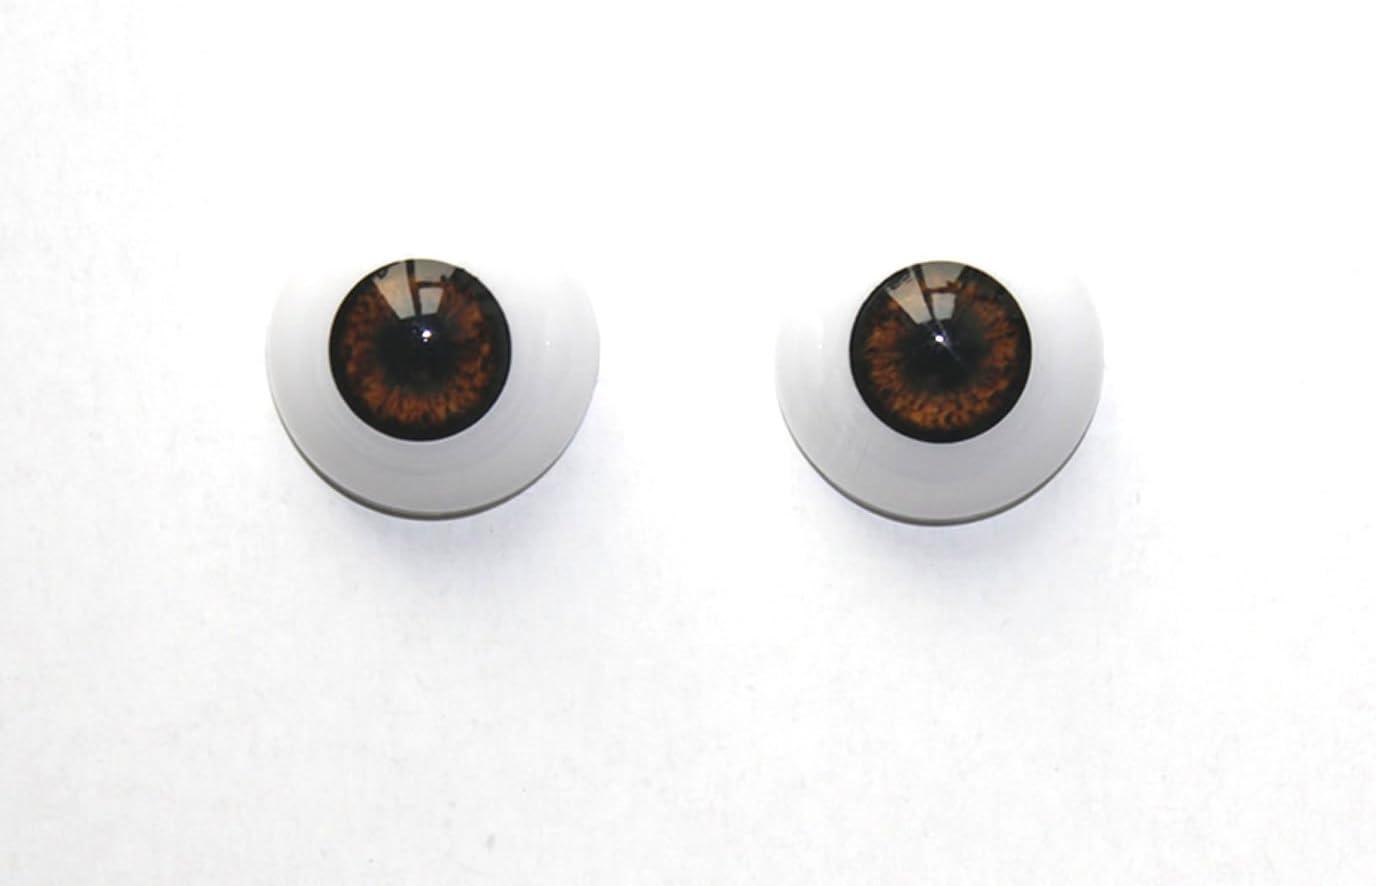 Good 22mm flatback Dark Brown Glass BJD Eyes for reborn//newBorn BJD doll